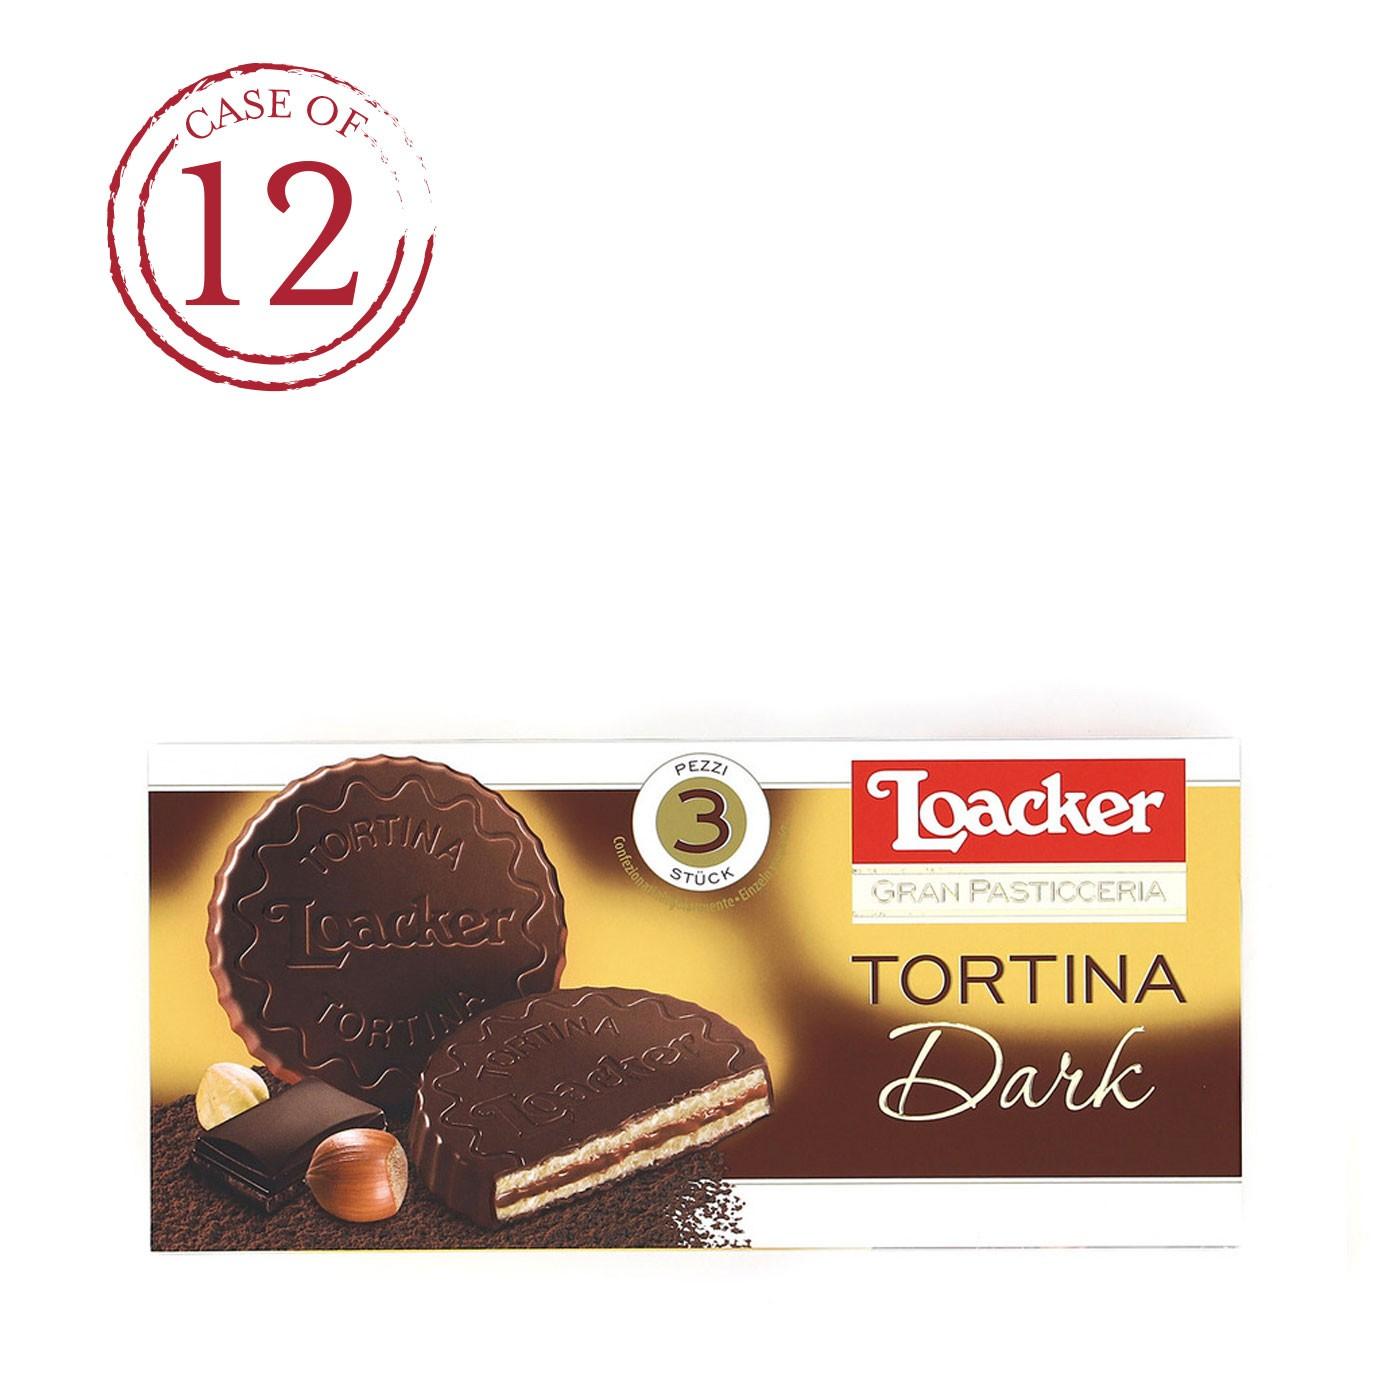 Gran Pasticceria Tortina Dark Noir 4.4 oz - Case of 12